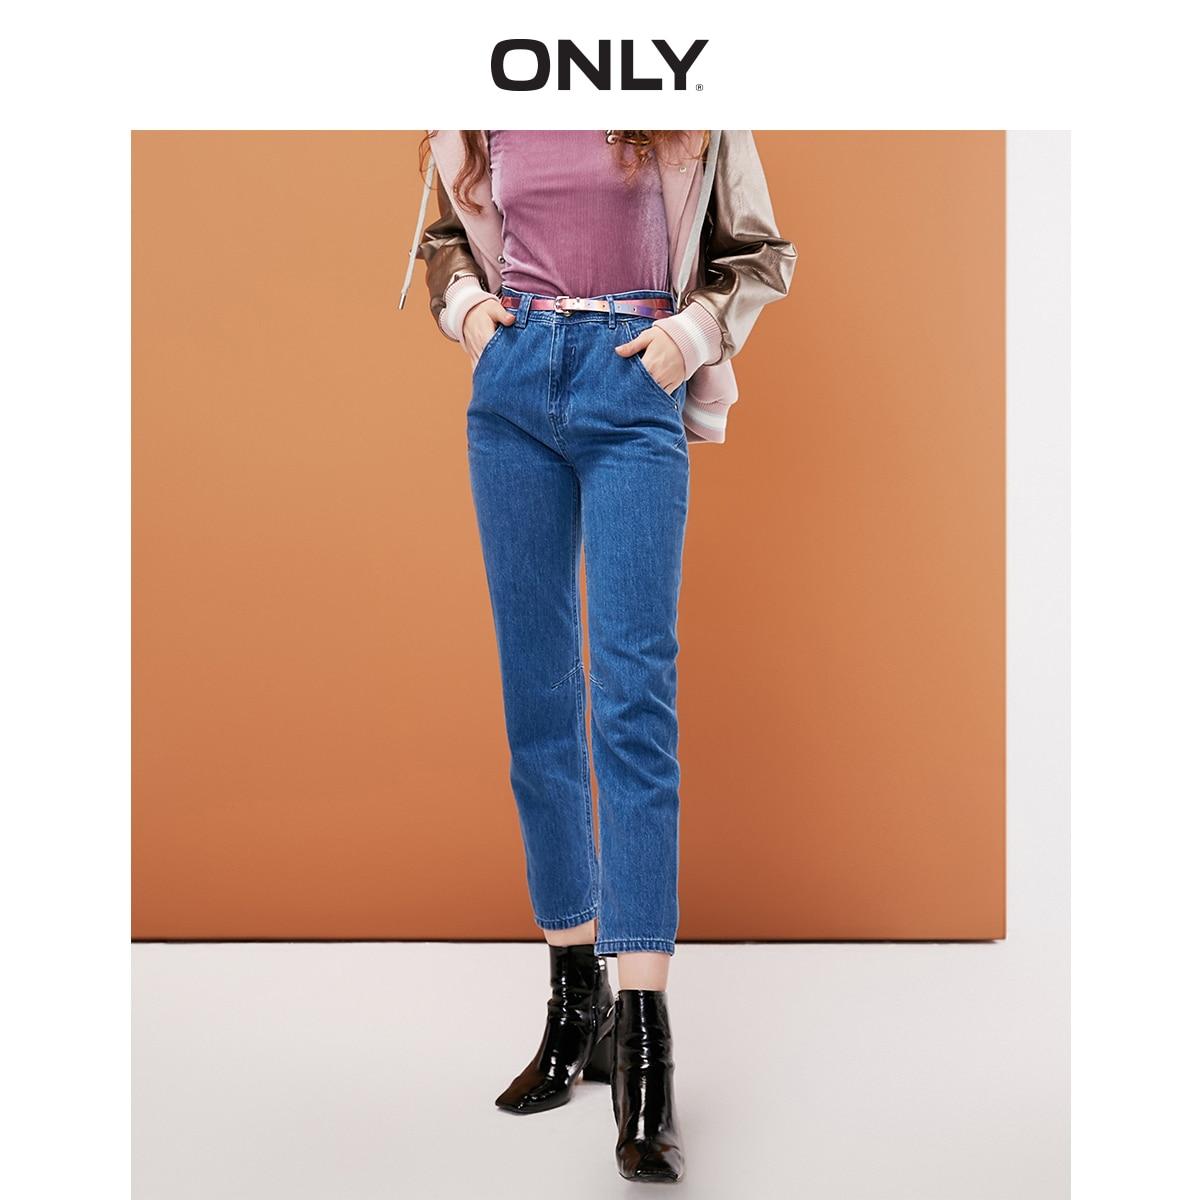 ONLY Women's Women's 100% Cotton Slim Fit Tight-leg Crop Jeans | 119149692